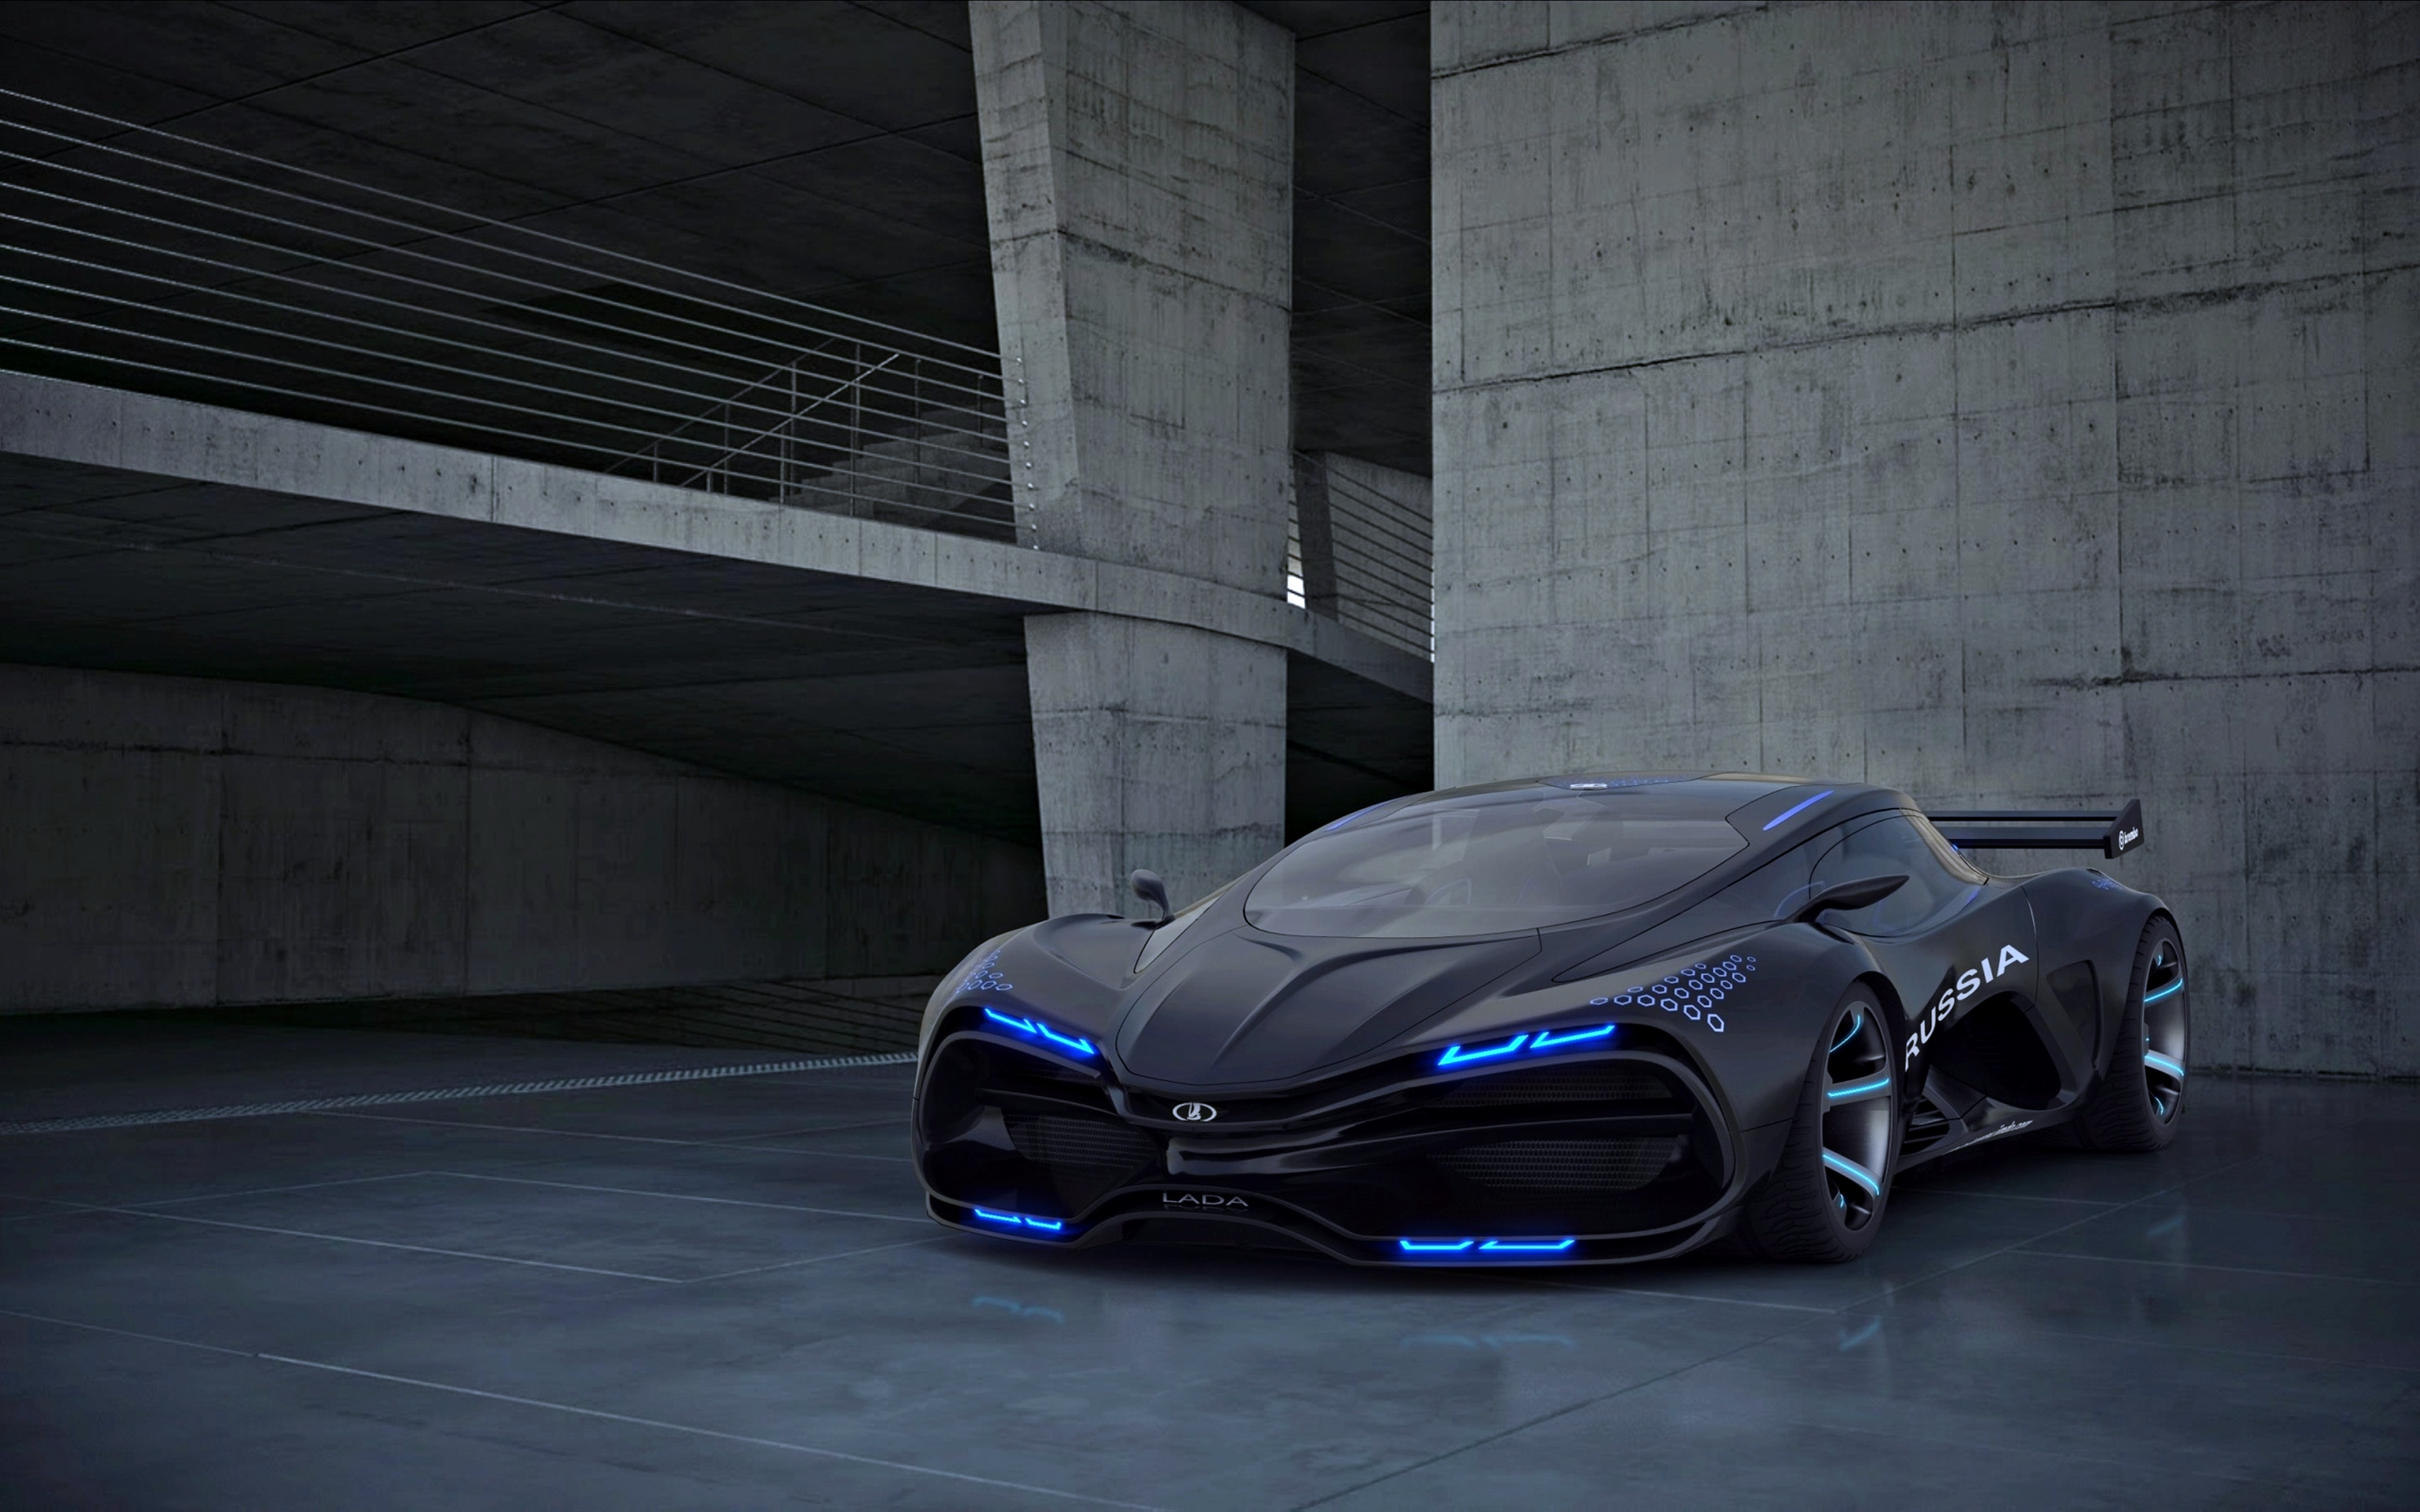 Lada Raven Concept Cars 4K Wallpaper Download   High Resolution 4K 3840x2400